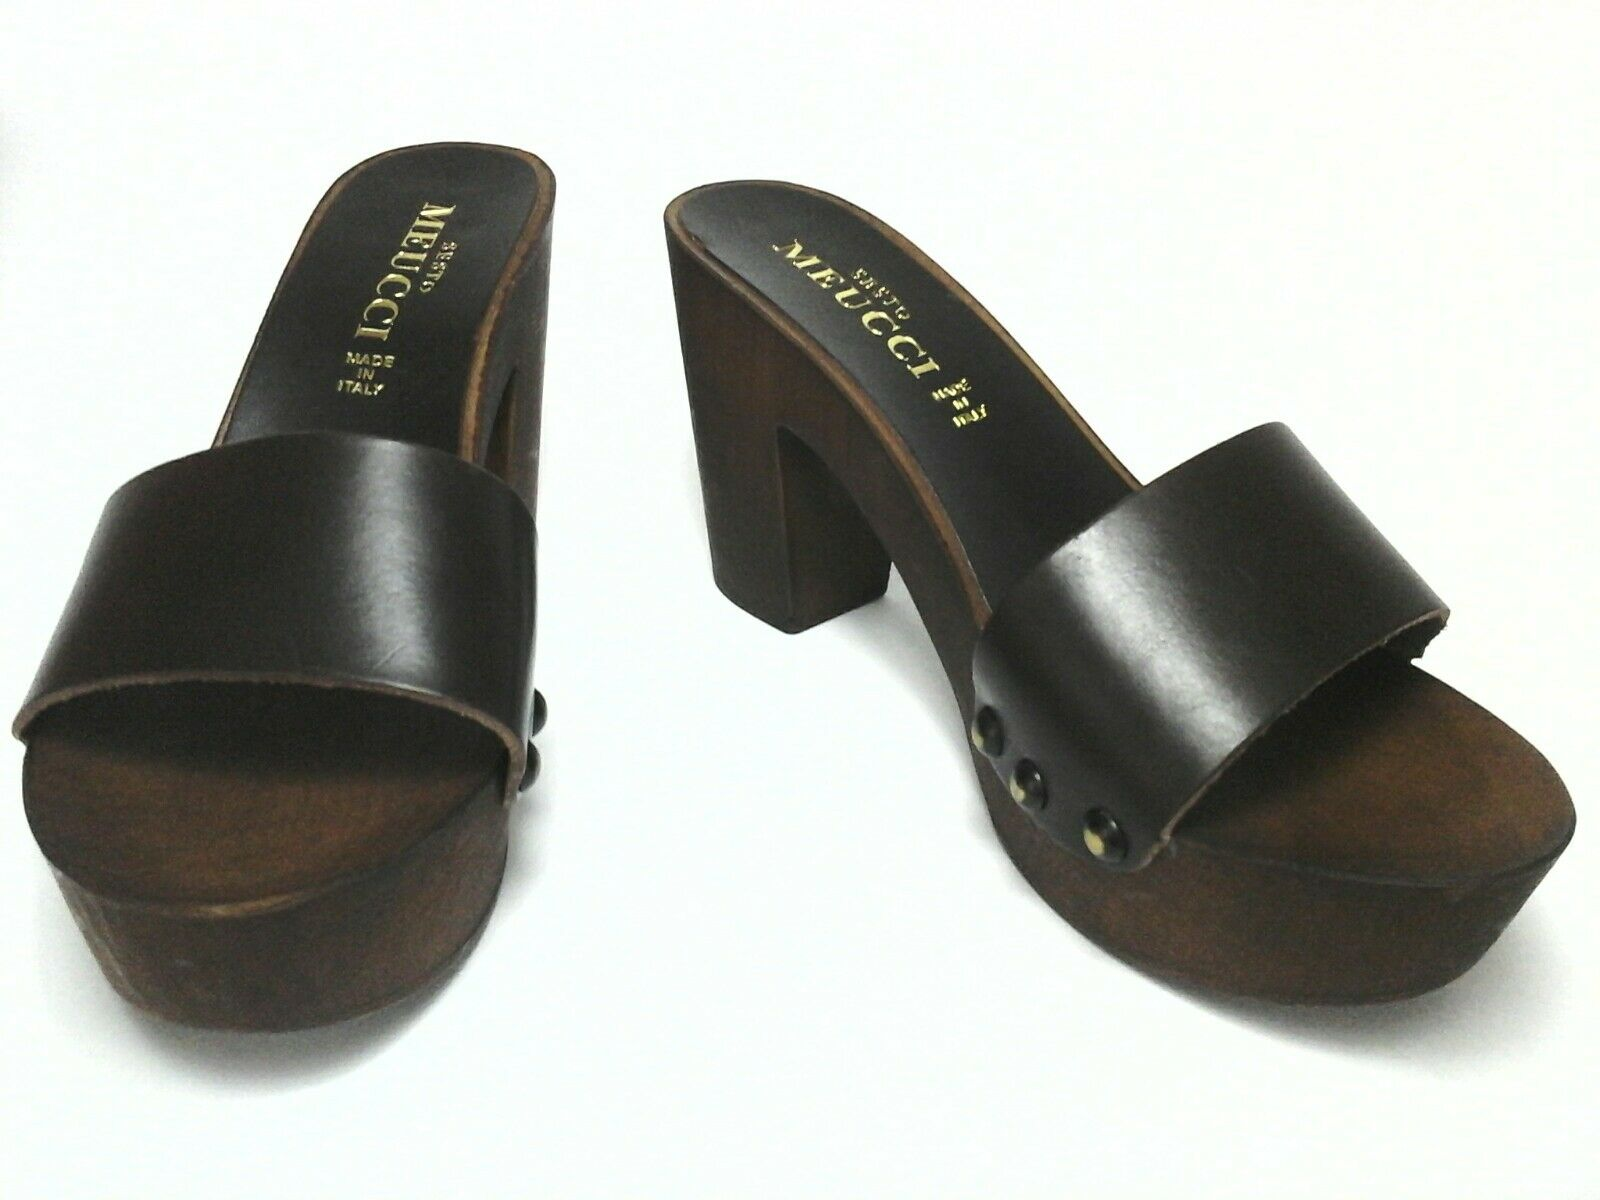 Sesto Wooden Meucci Damenschuhe Braun Leder Wooden Sesto Platform Heel Slides Schuhes US 7 EU 37.5 fa99be